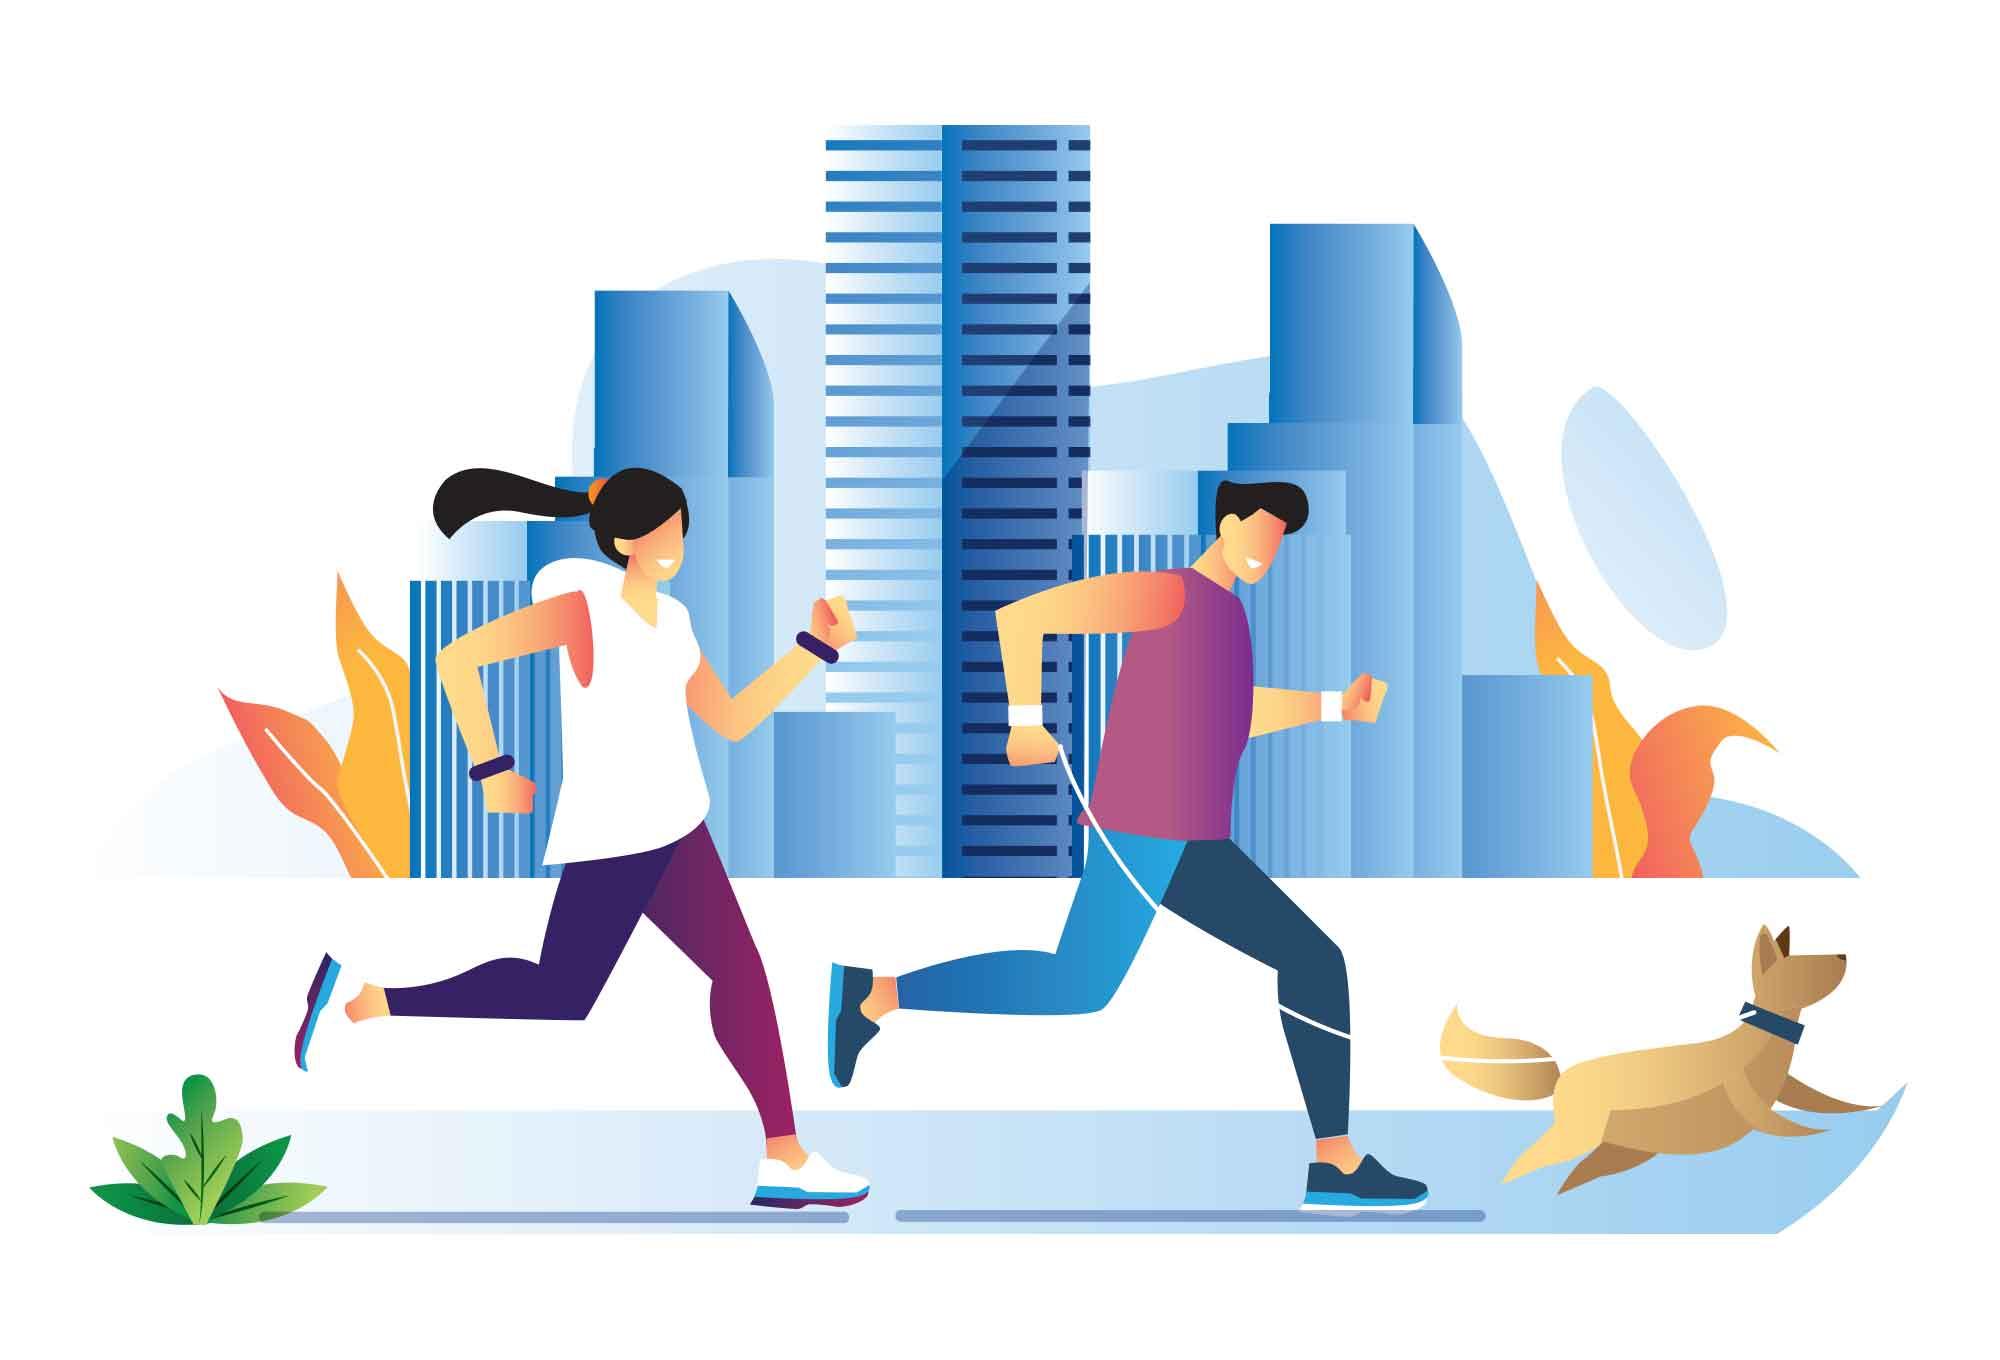 Jogging with a Dog Illustration